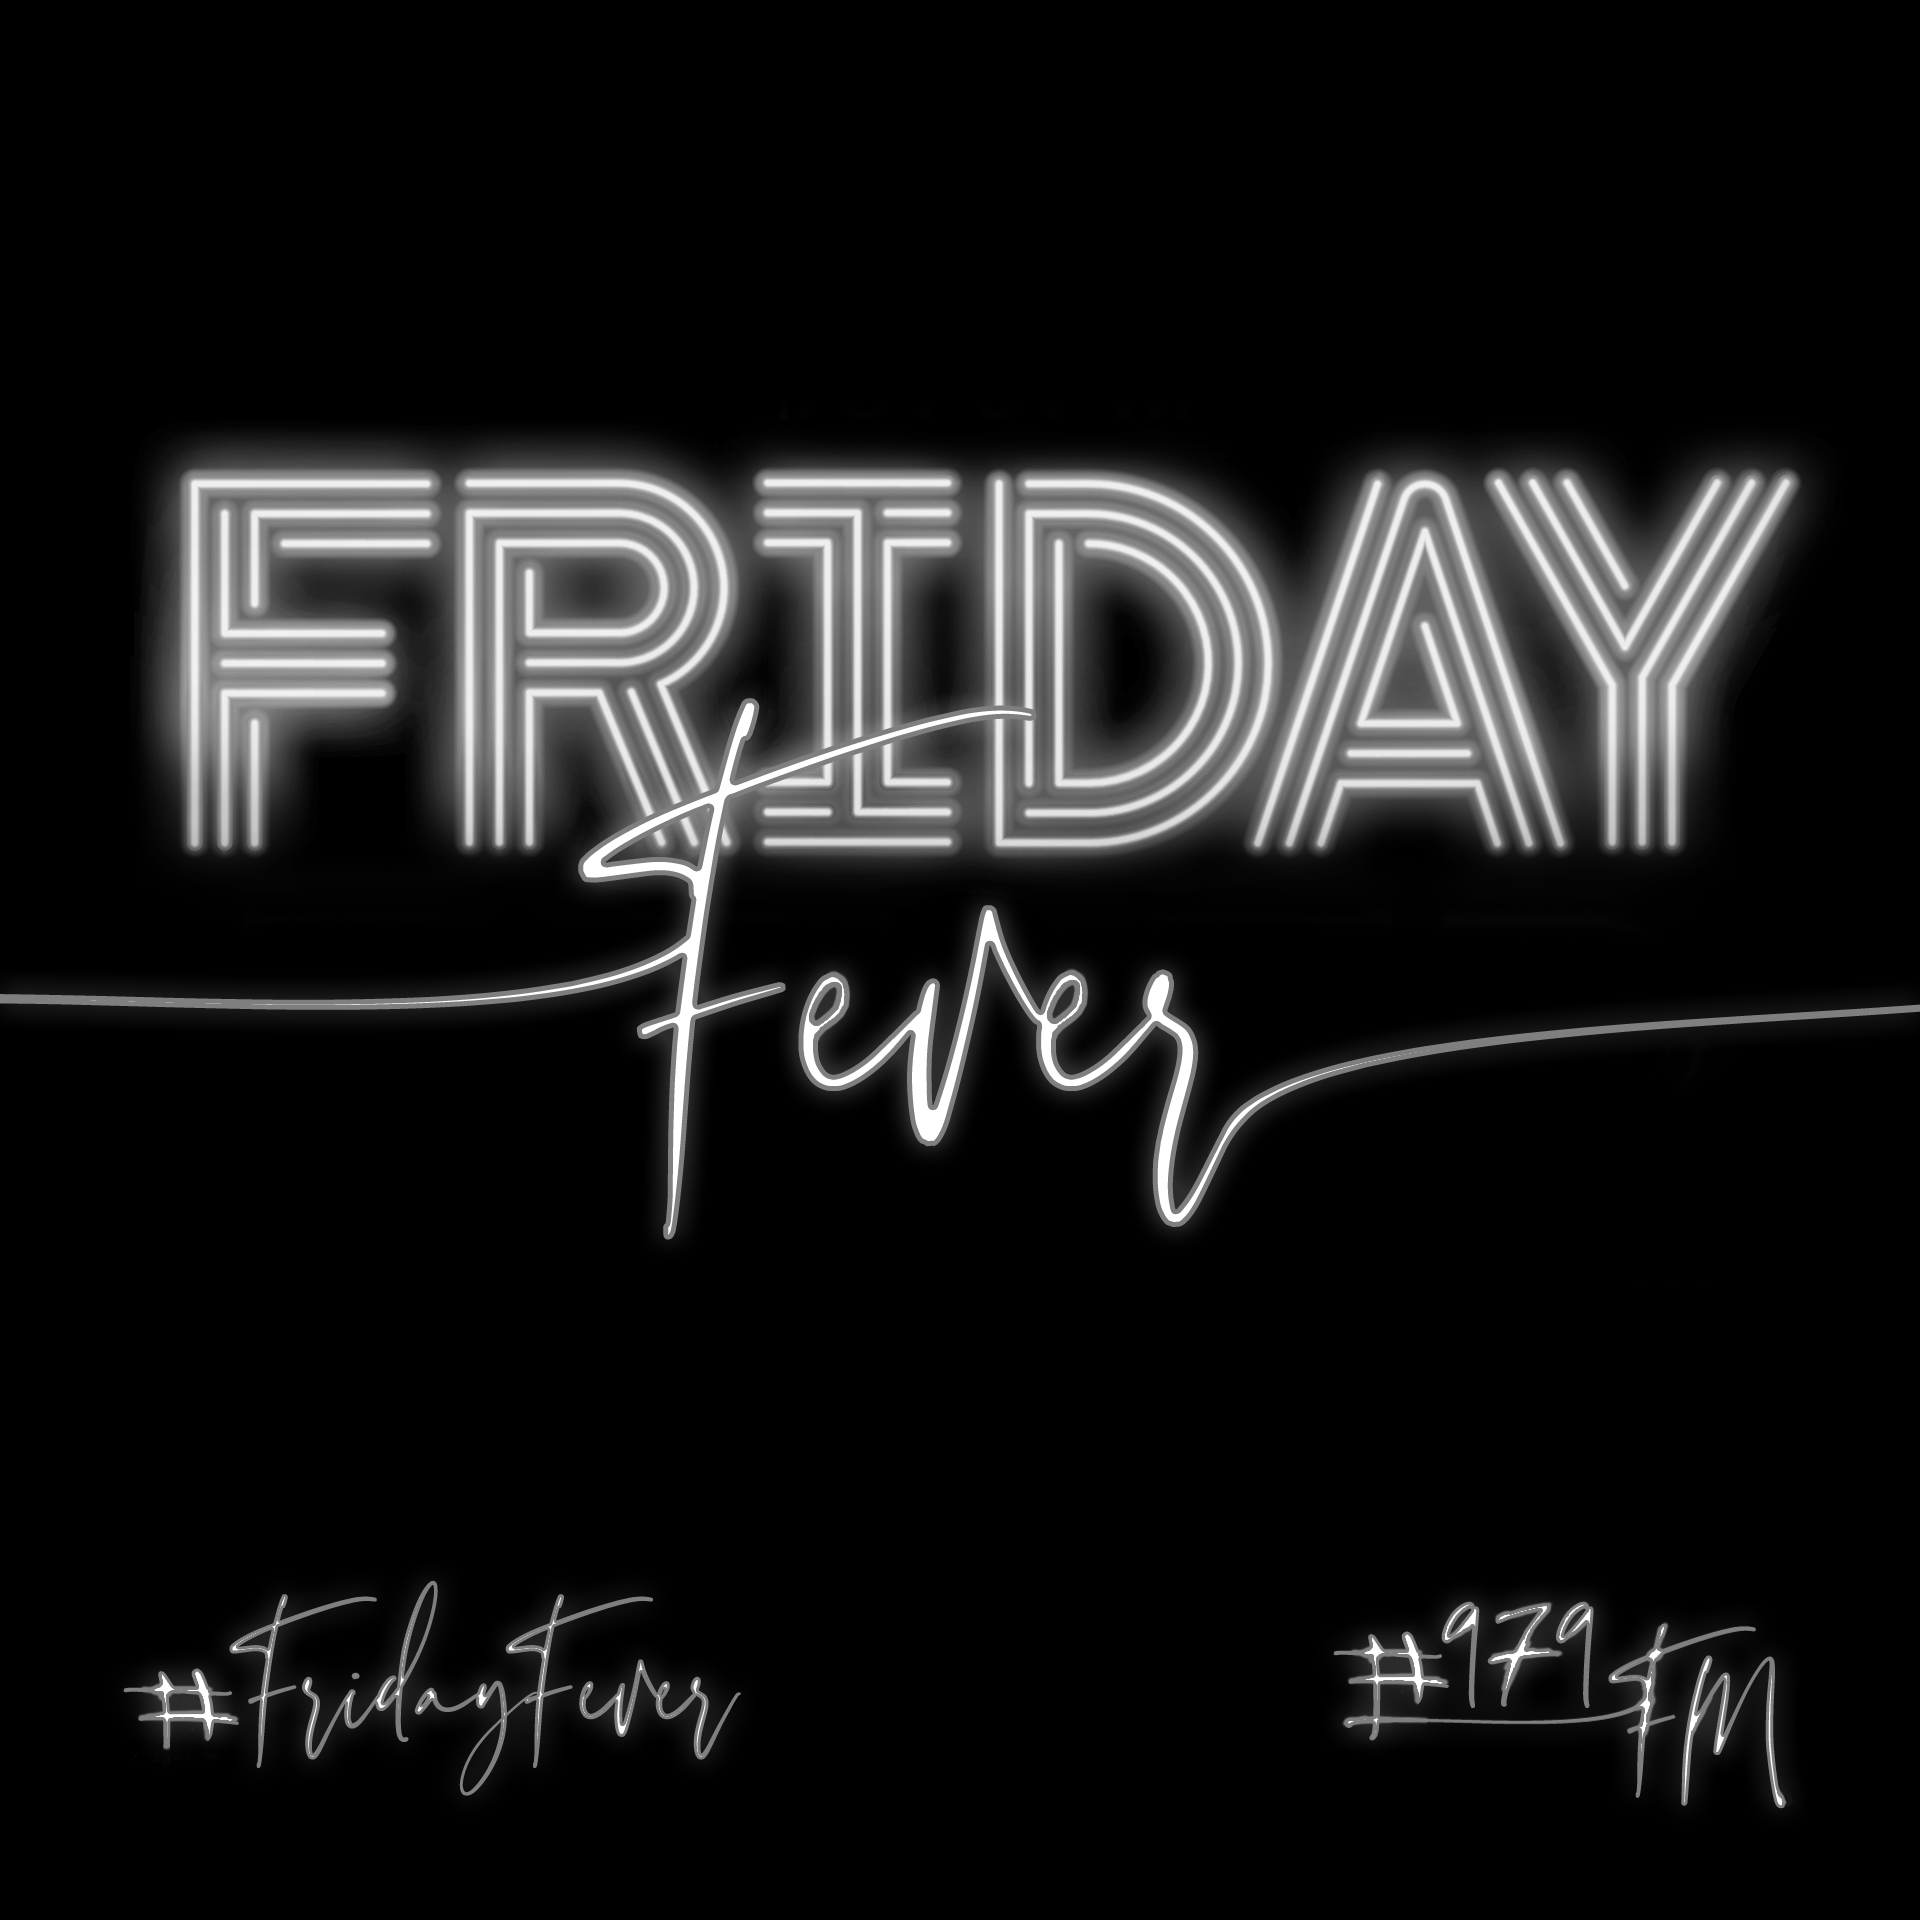 FridayFever-Vegas&Faustine-WhiteOnBlack